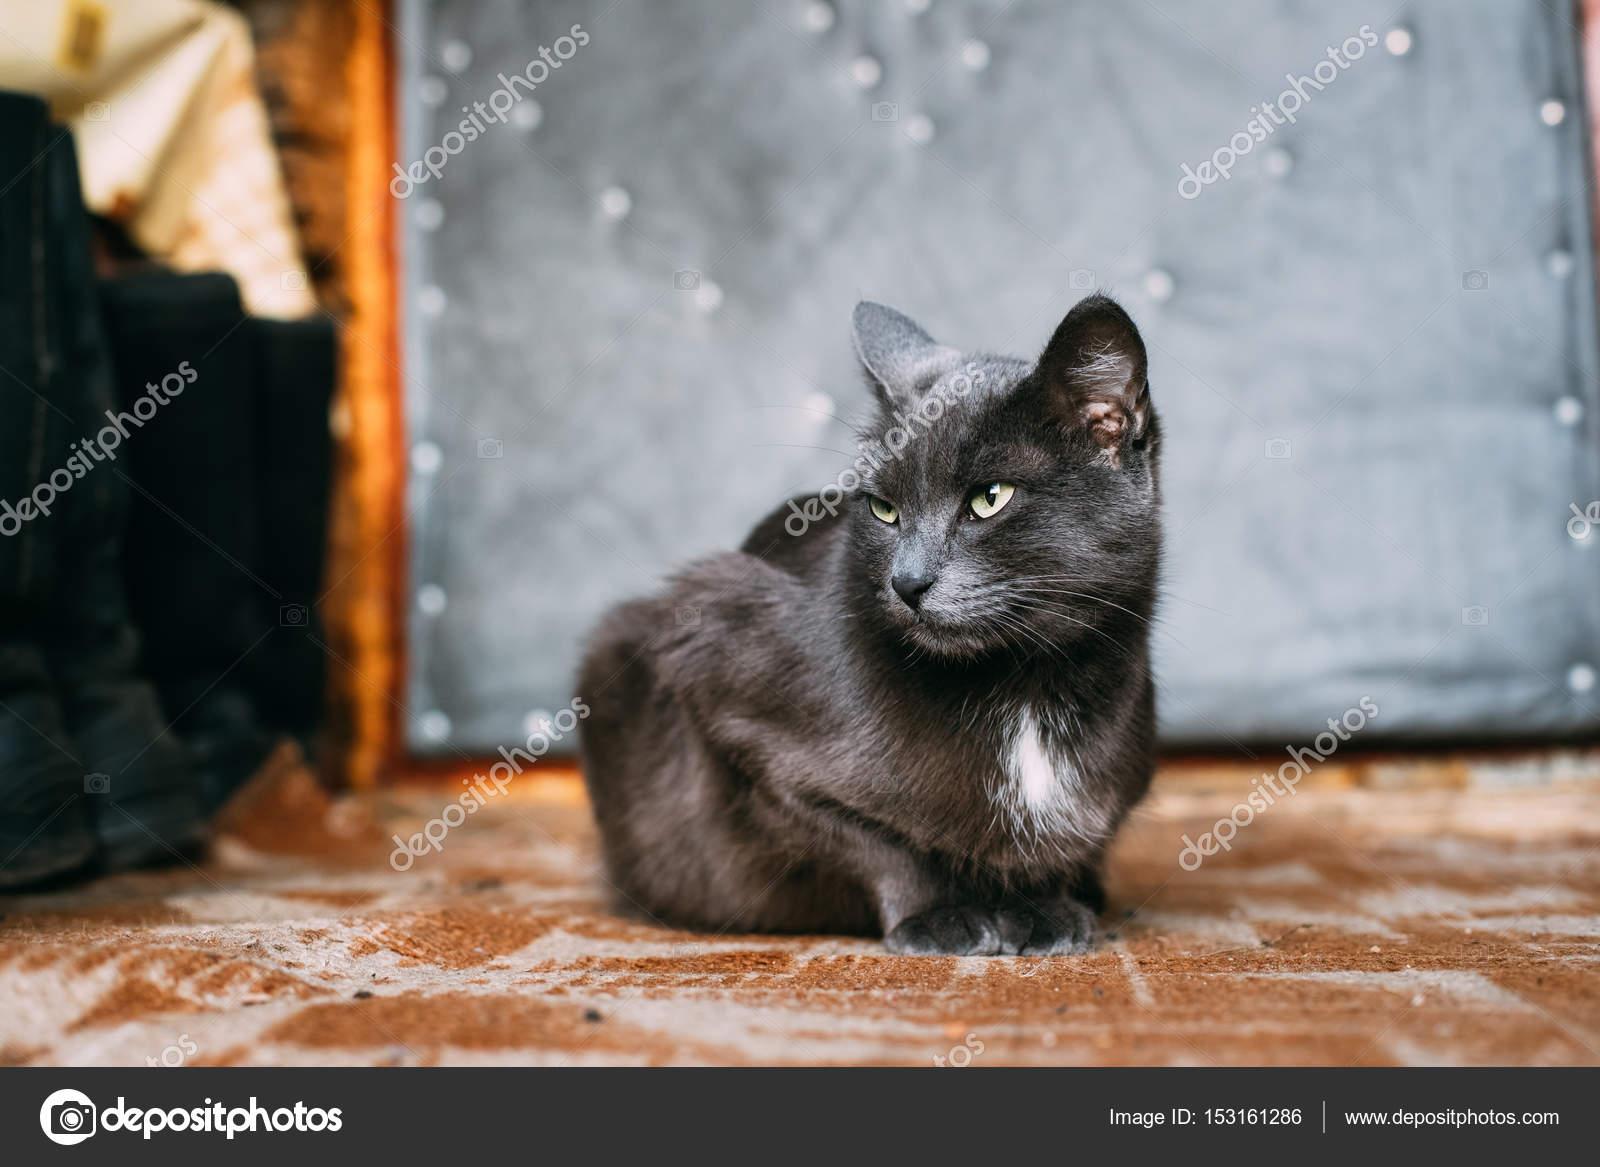 Russian Blue Cat Kitten Resting Porch An Old Village Rustic